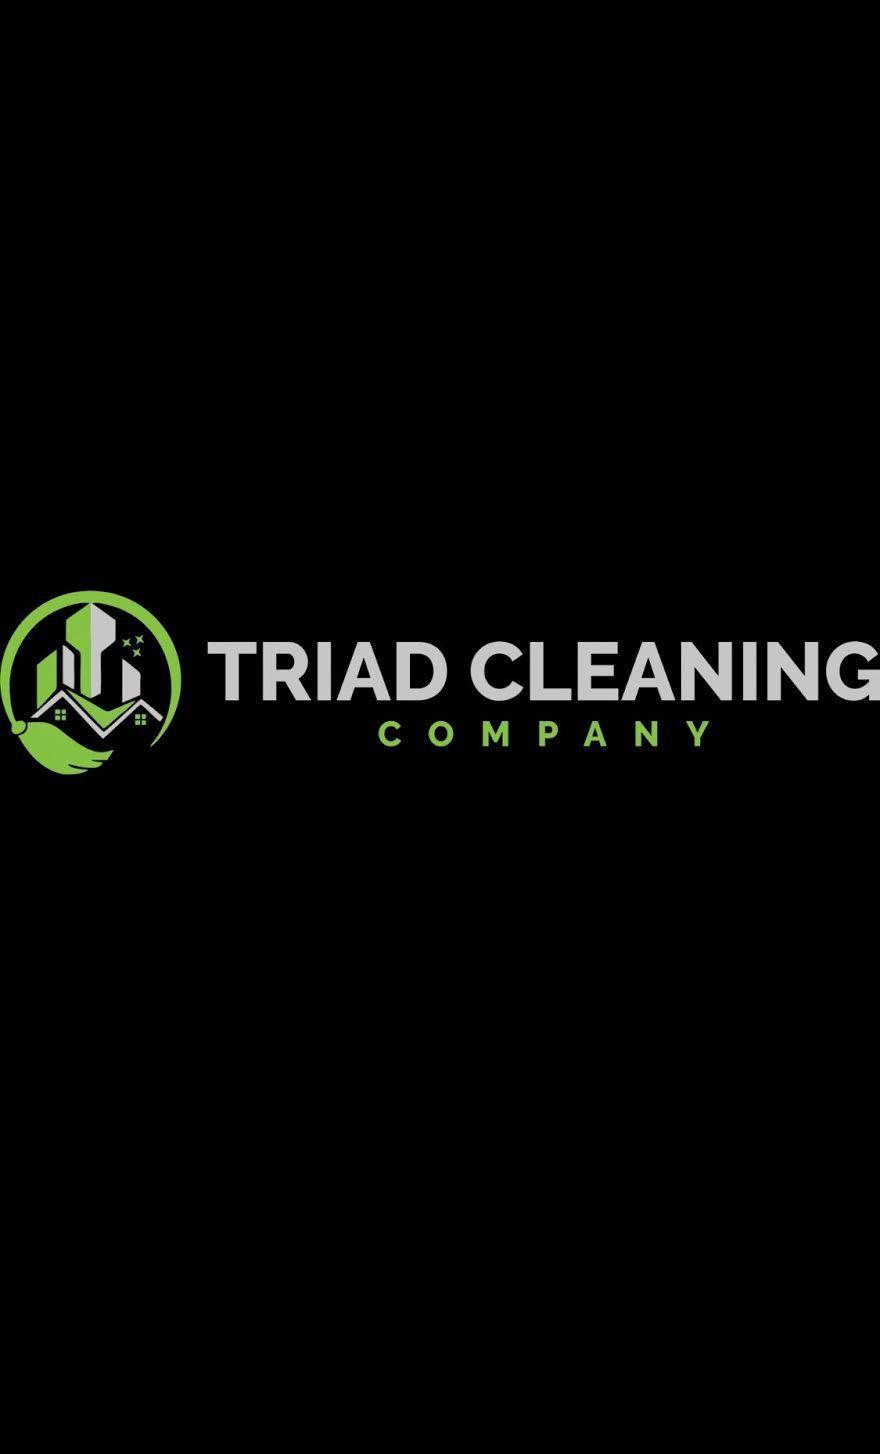 Triad Cleaning Company